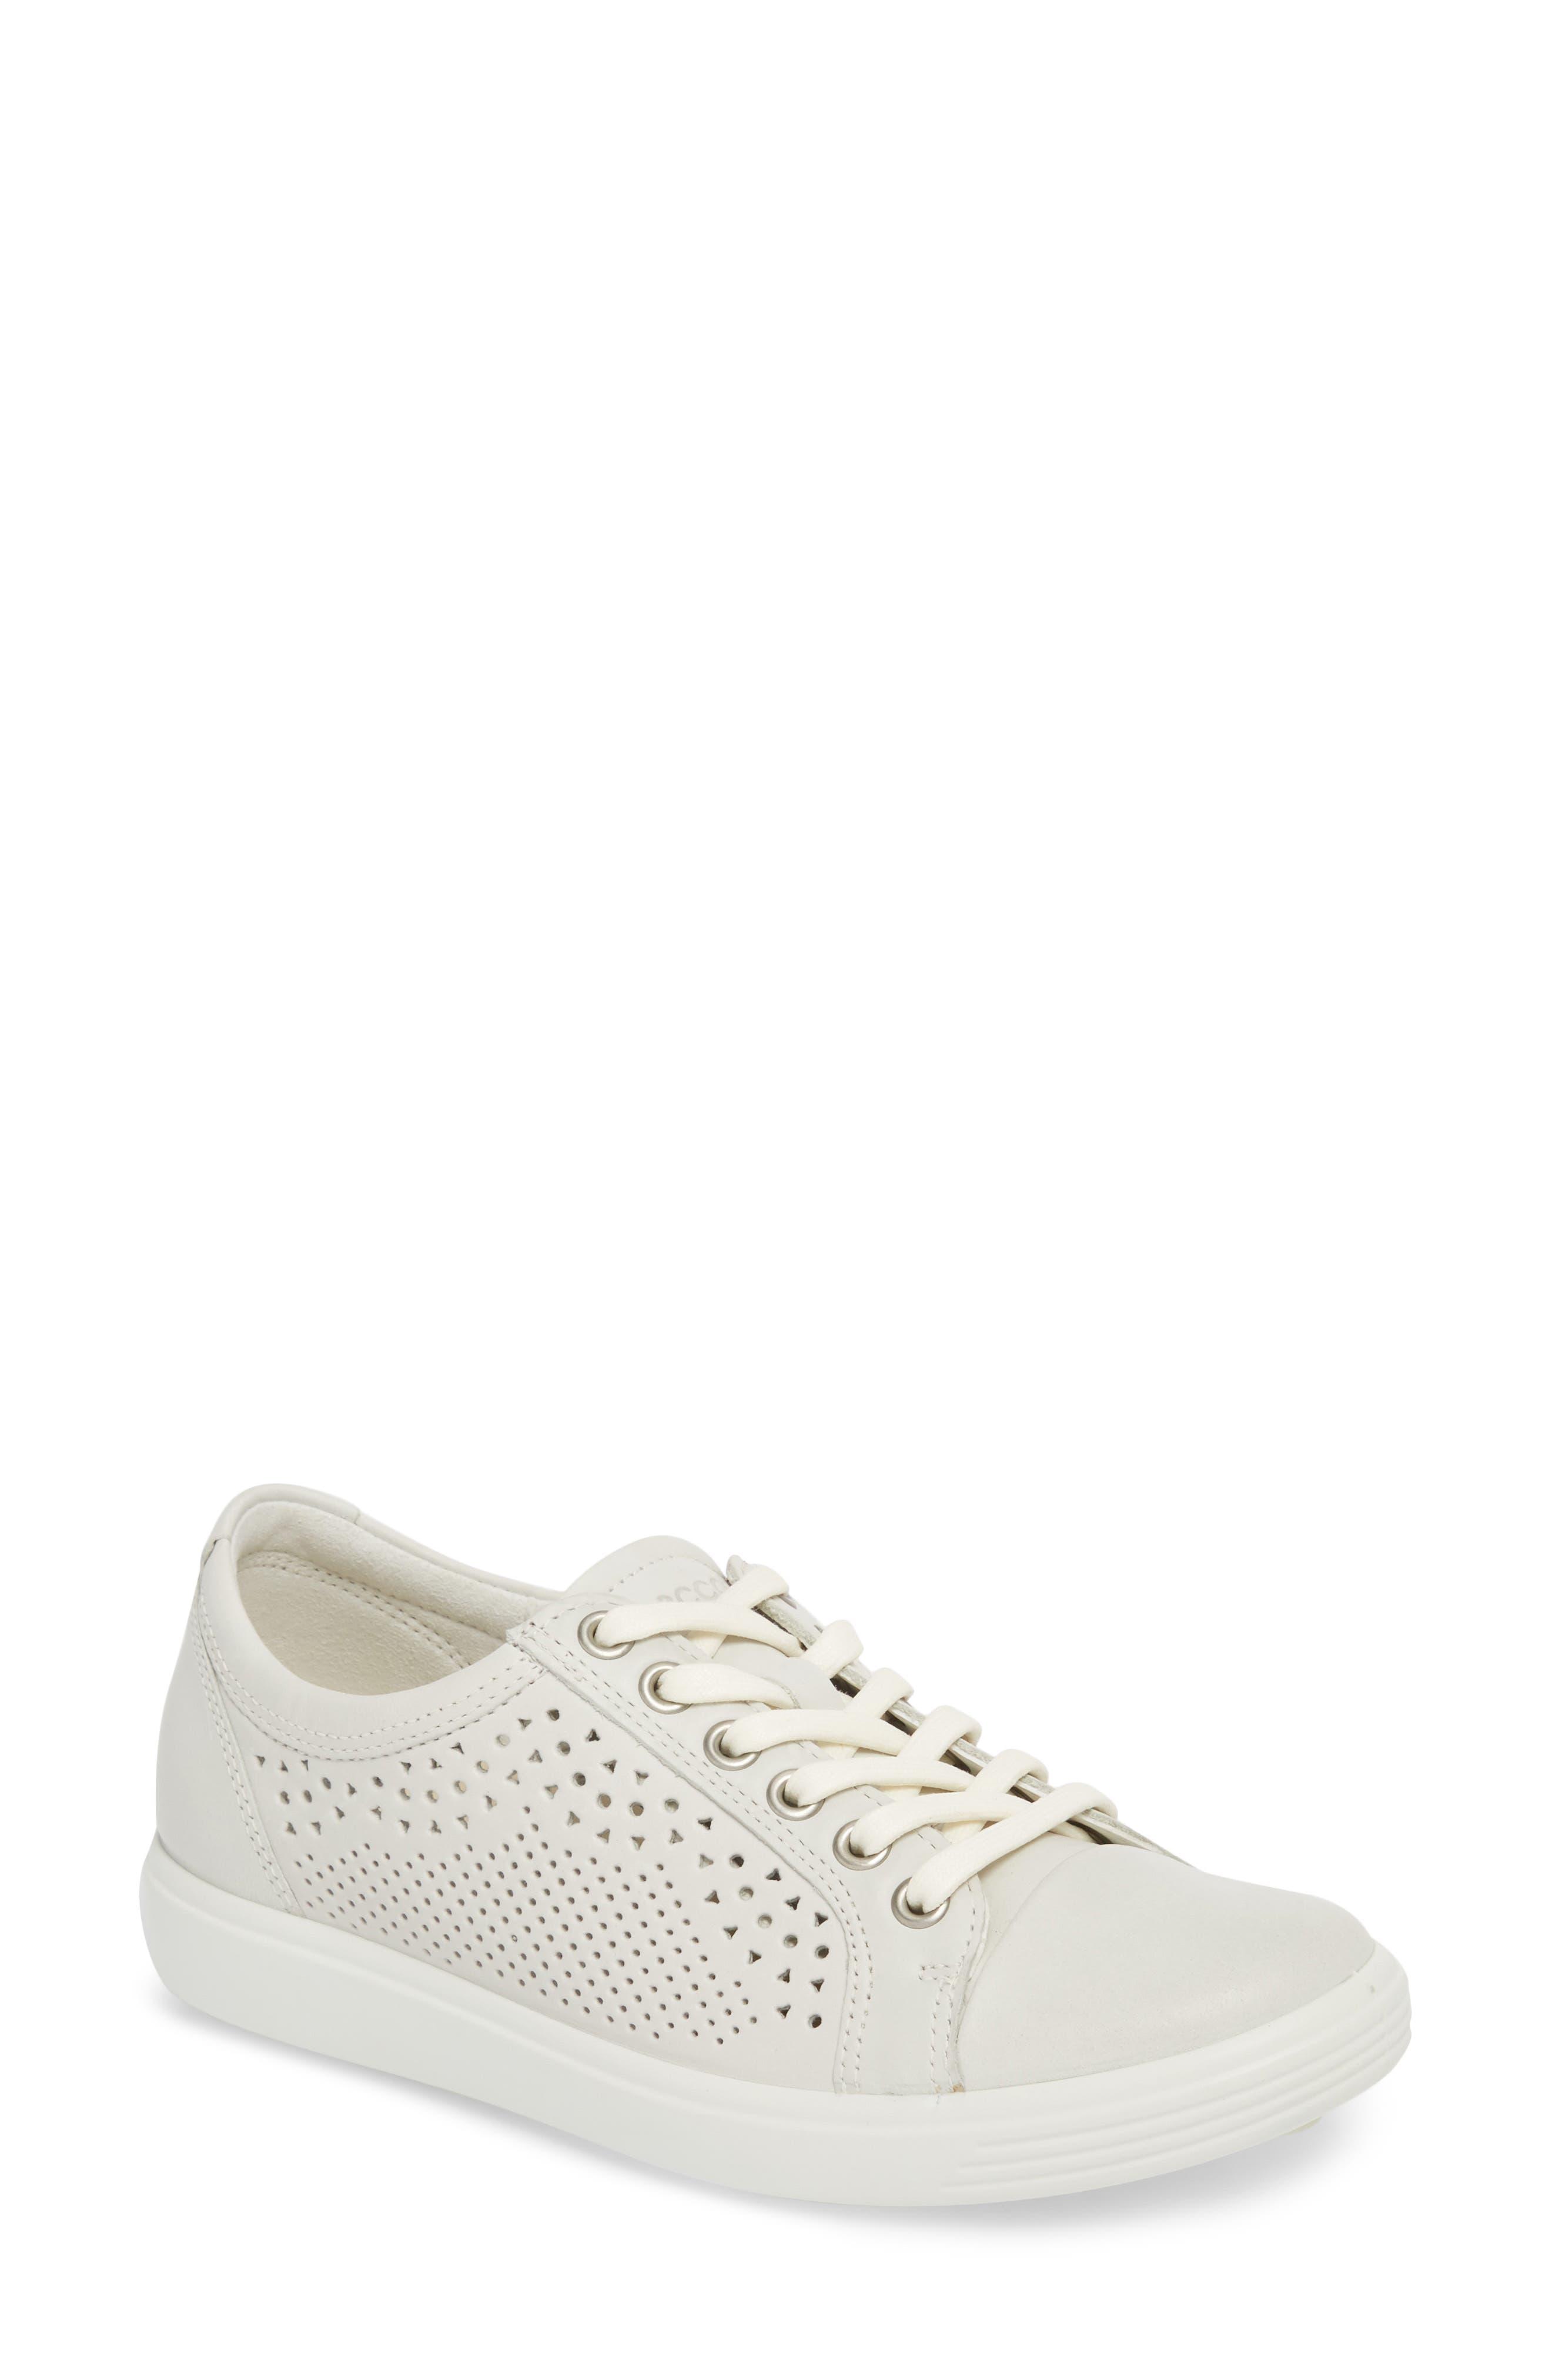 Alternate Image 1 Selected - ECCO Soft 7 Sneaker (Women)